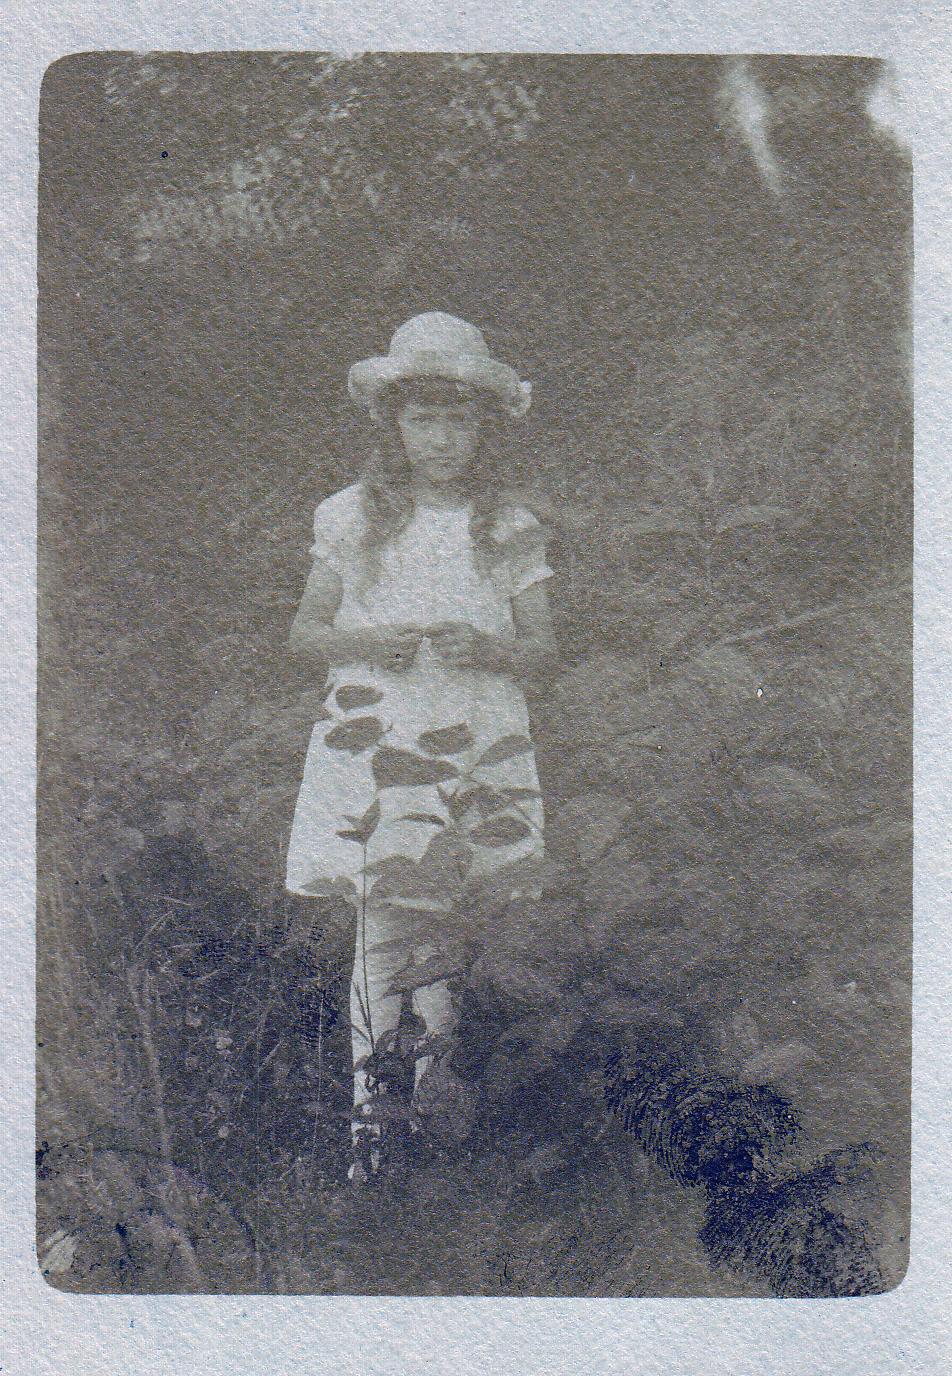 Mormor, 17 april 1921.